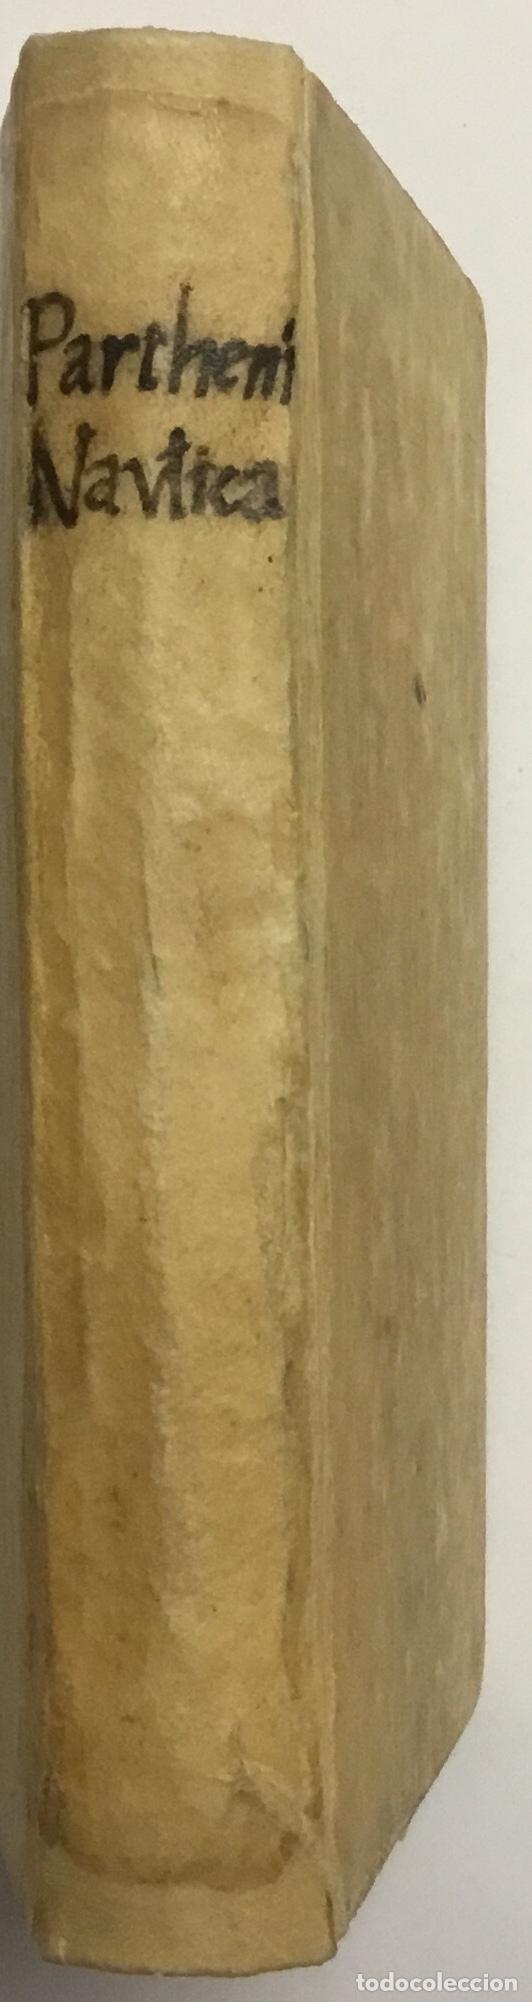 Libros antiguos: PISCATORIA, ET NAUTICA. - GIANNETTASIO, Niccolò Partenio. NÁPOLES, 1685. GRABADOS. - Foto 10 - 112435487